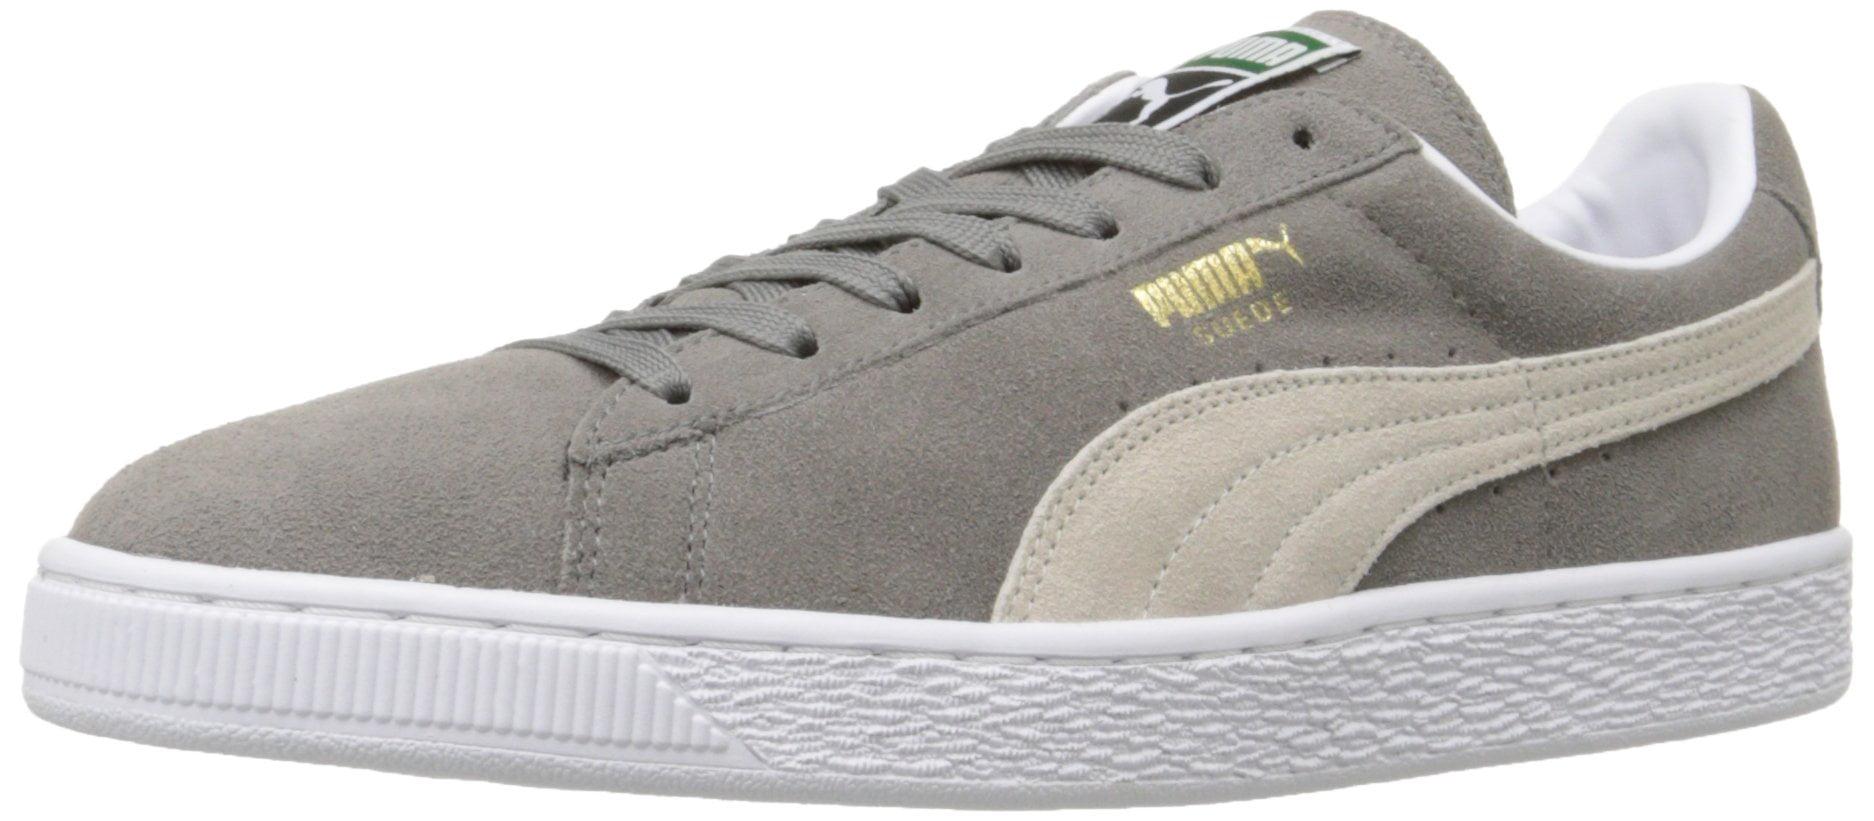 puma suede classic sneaker,steeple gray